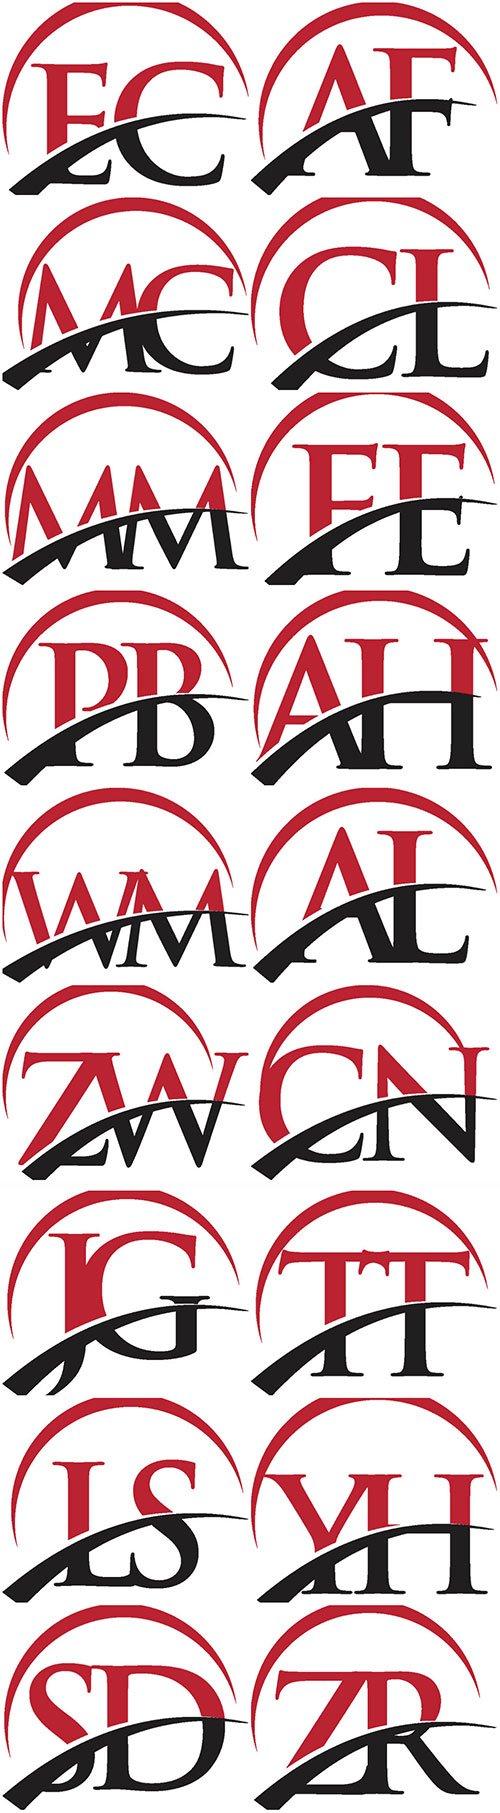 Red vector letter logo swoosh